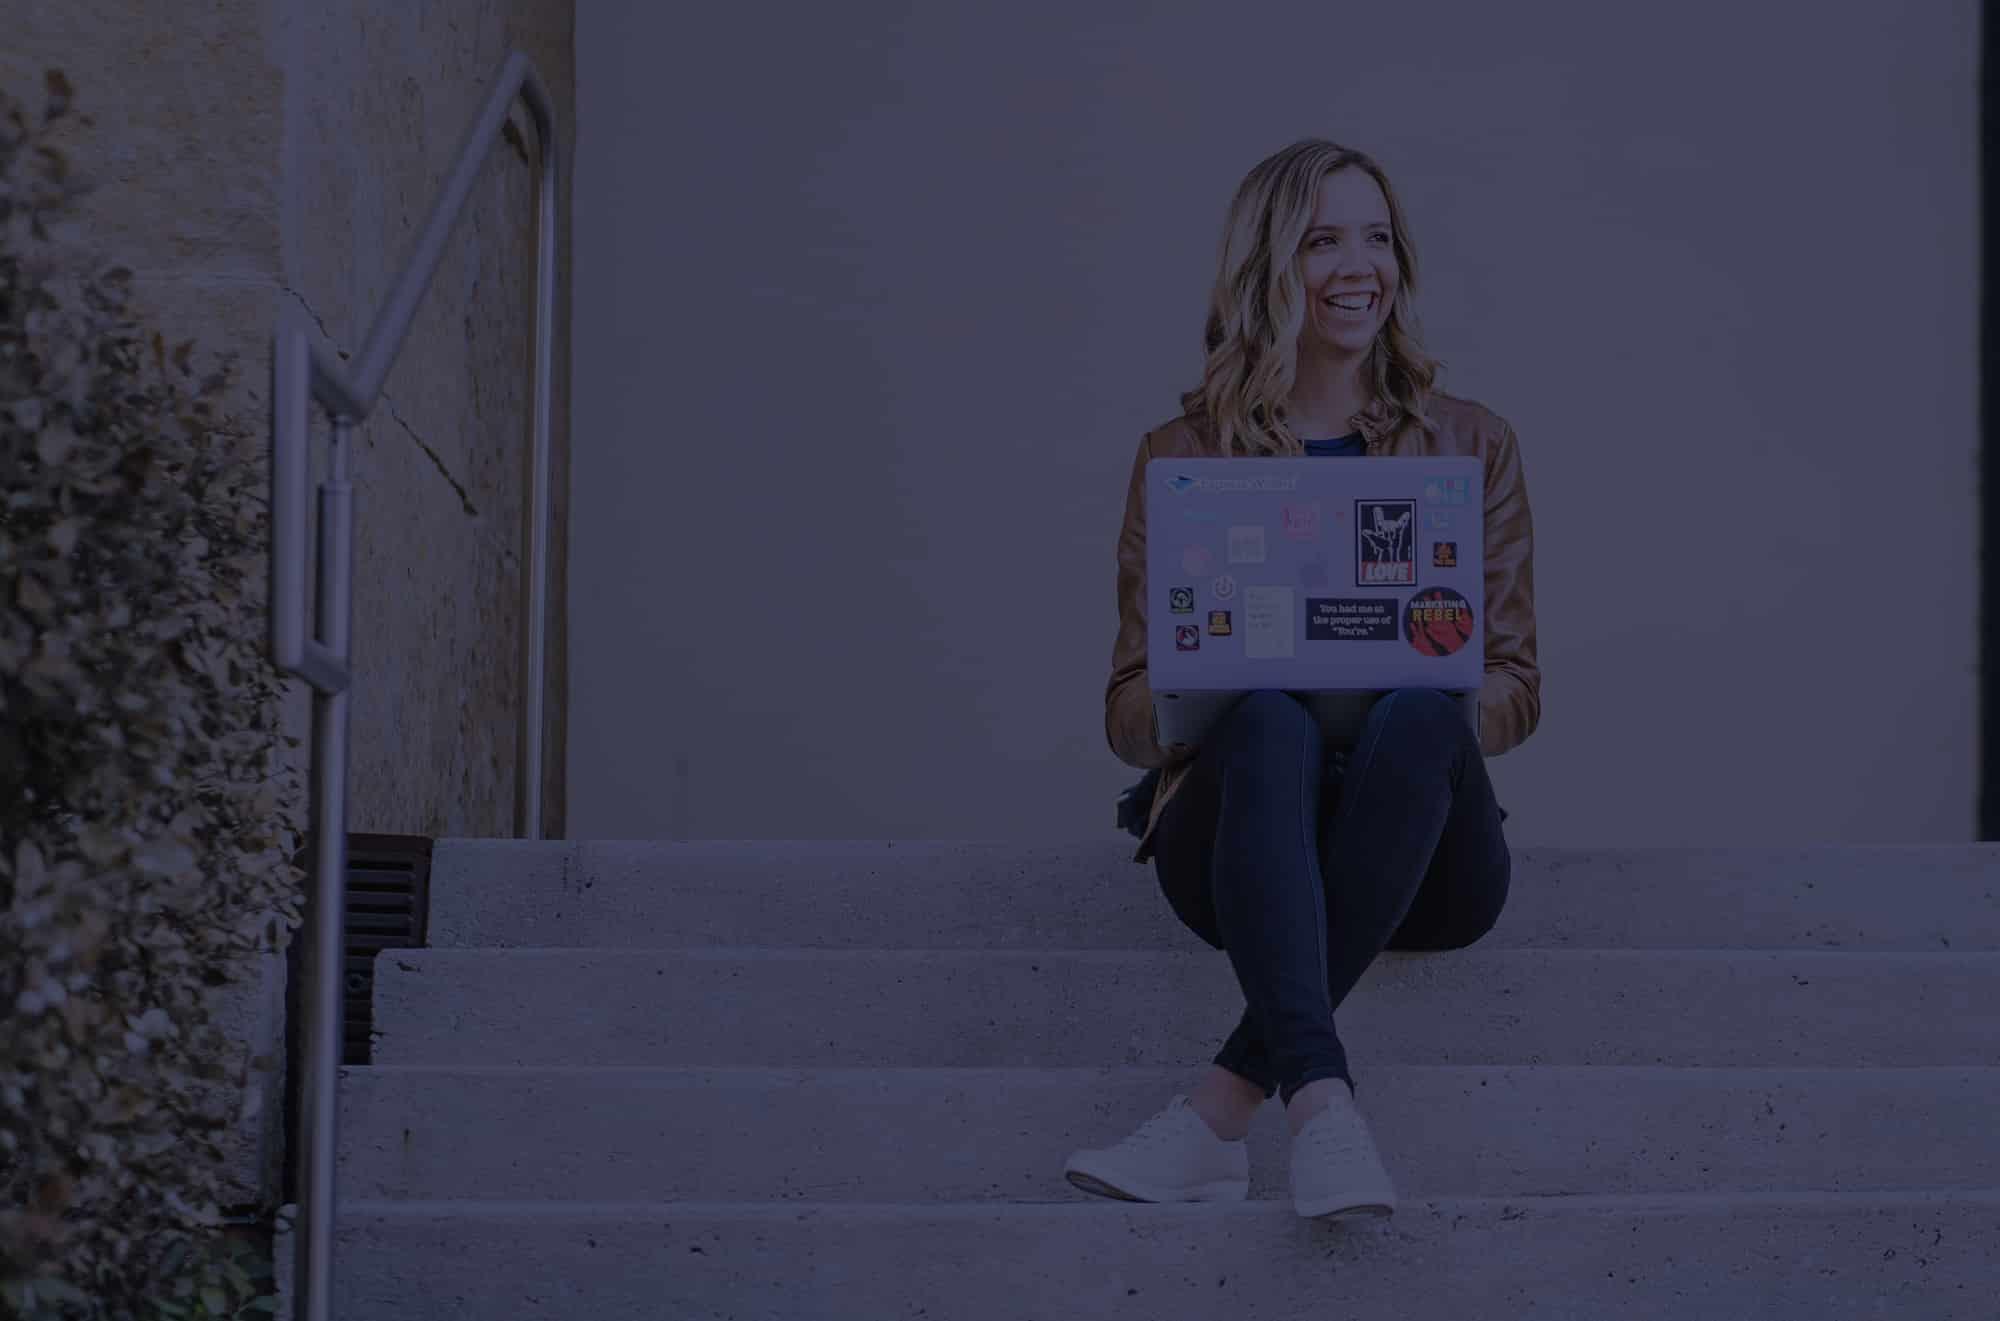 julia mccoy posing with laptop